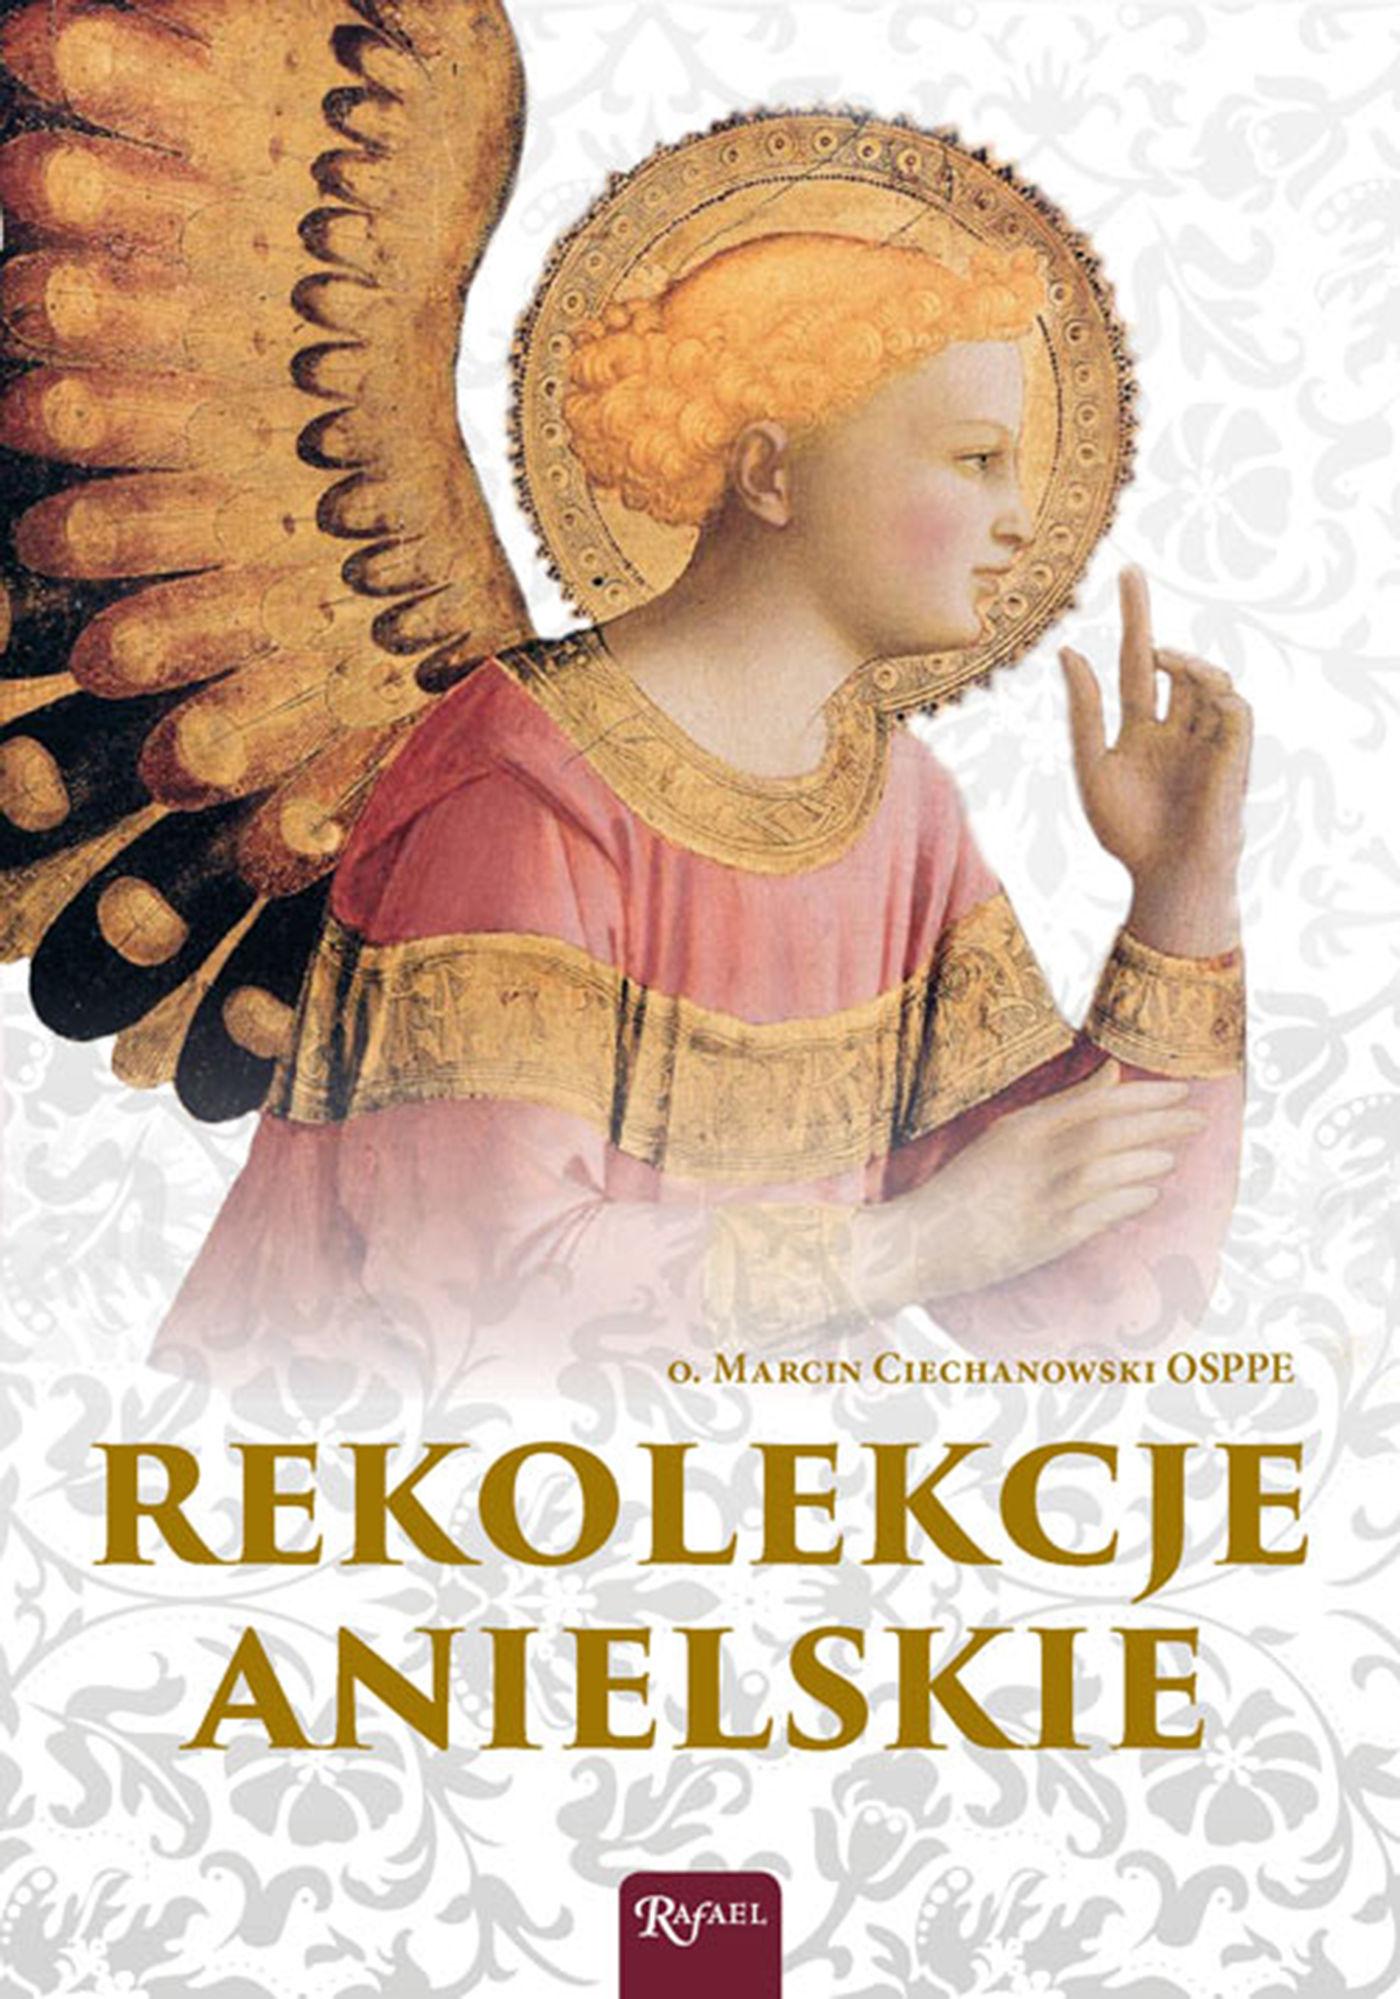 Rekolekcje anielskie - o. Marcin Ciechanowski OSPPE - audiobook